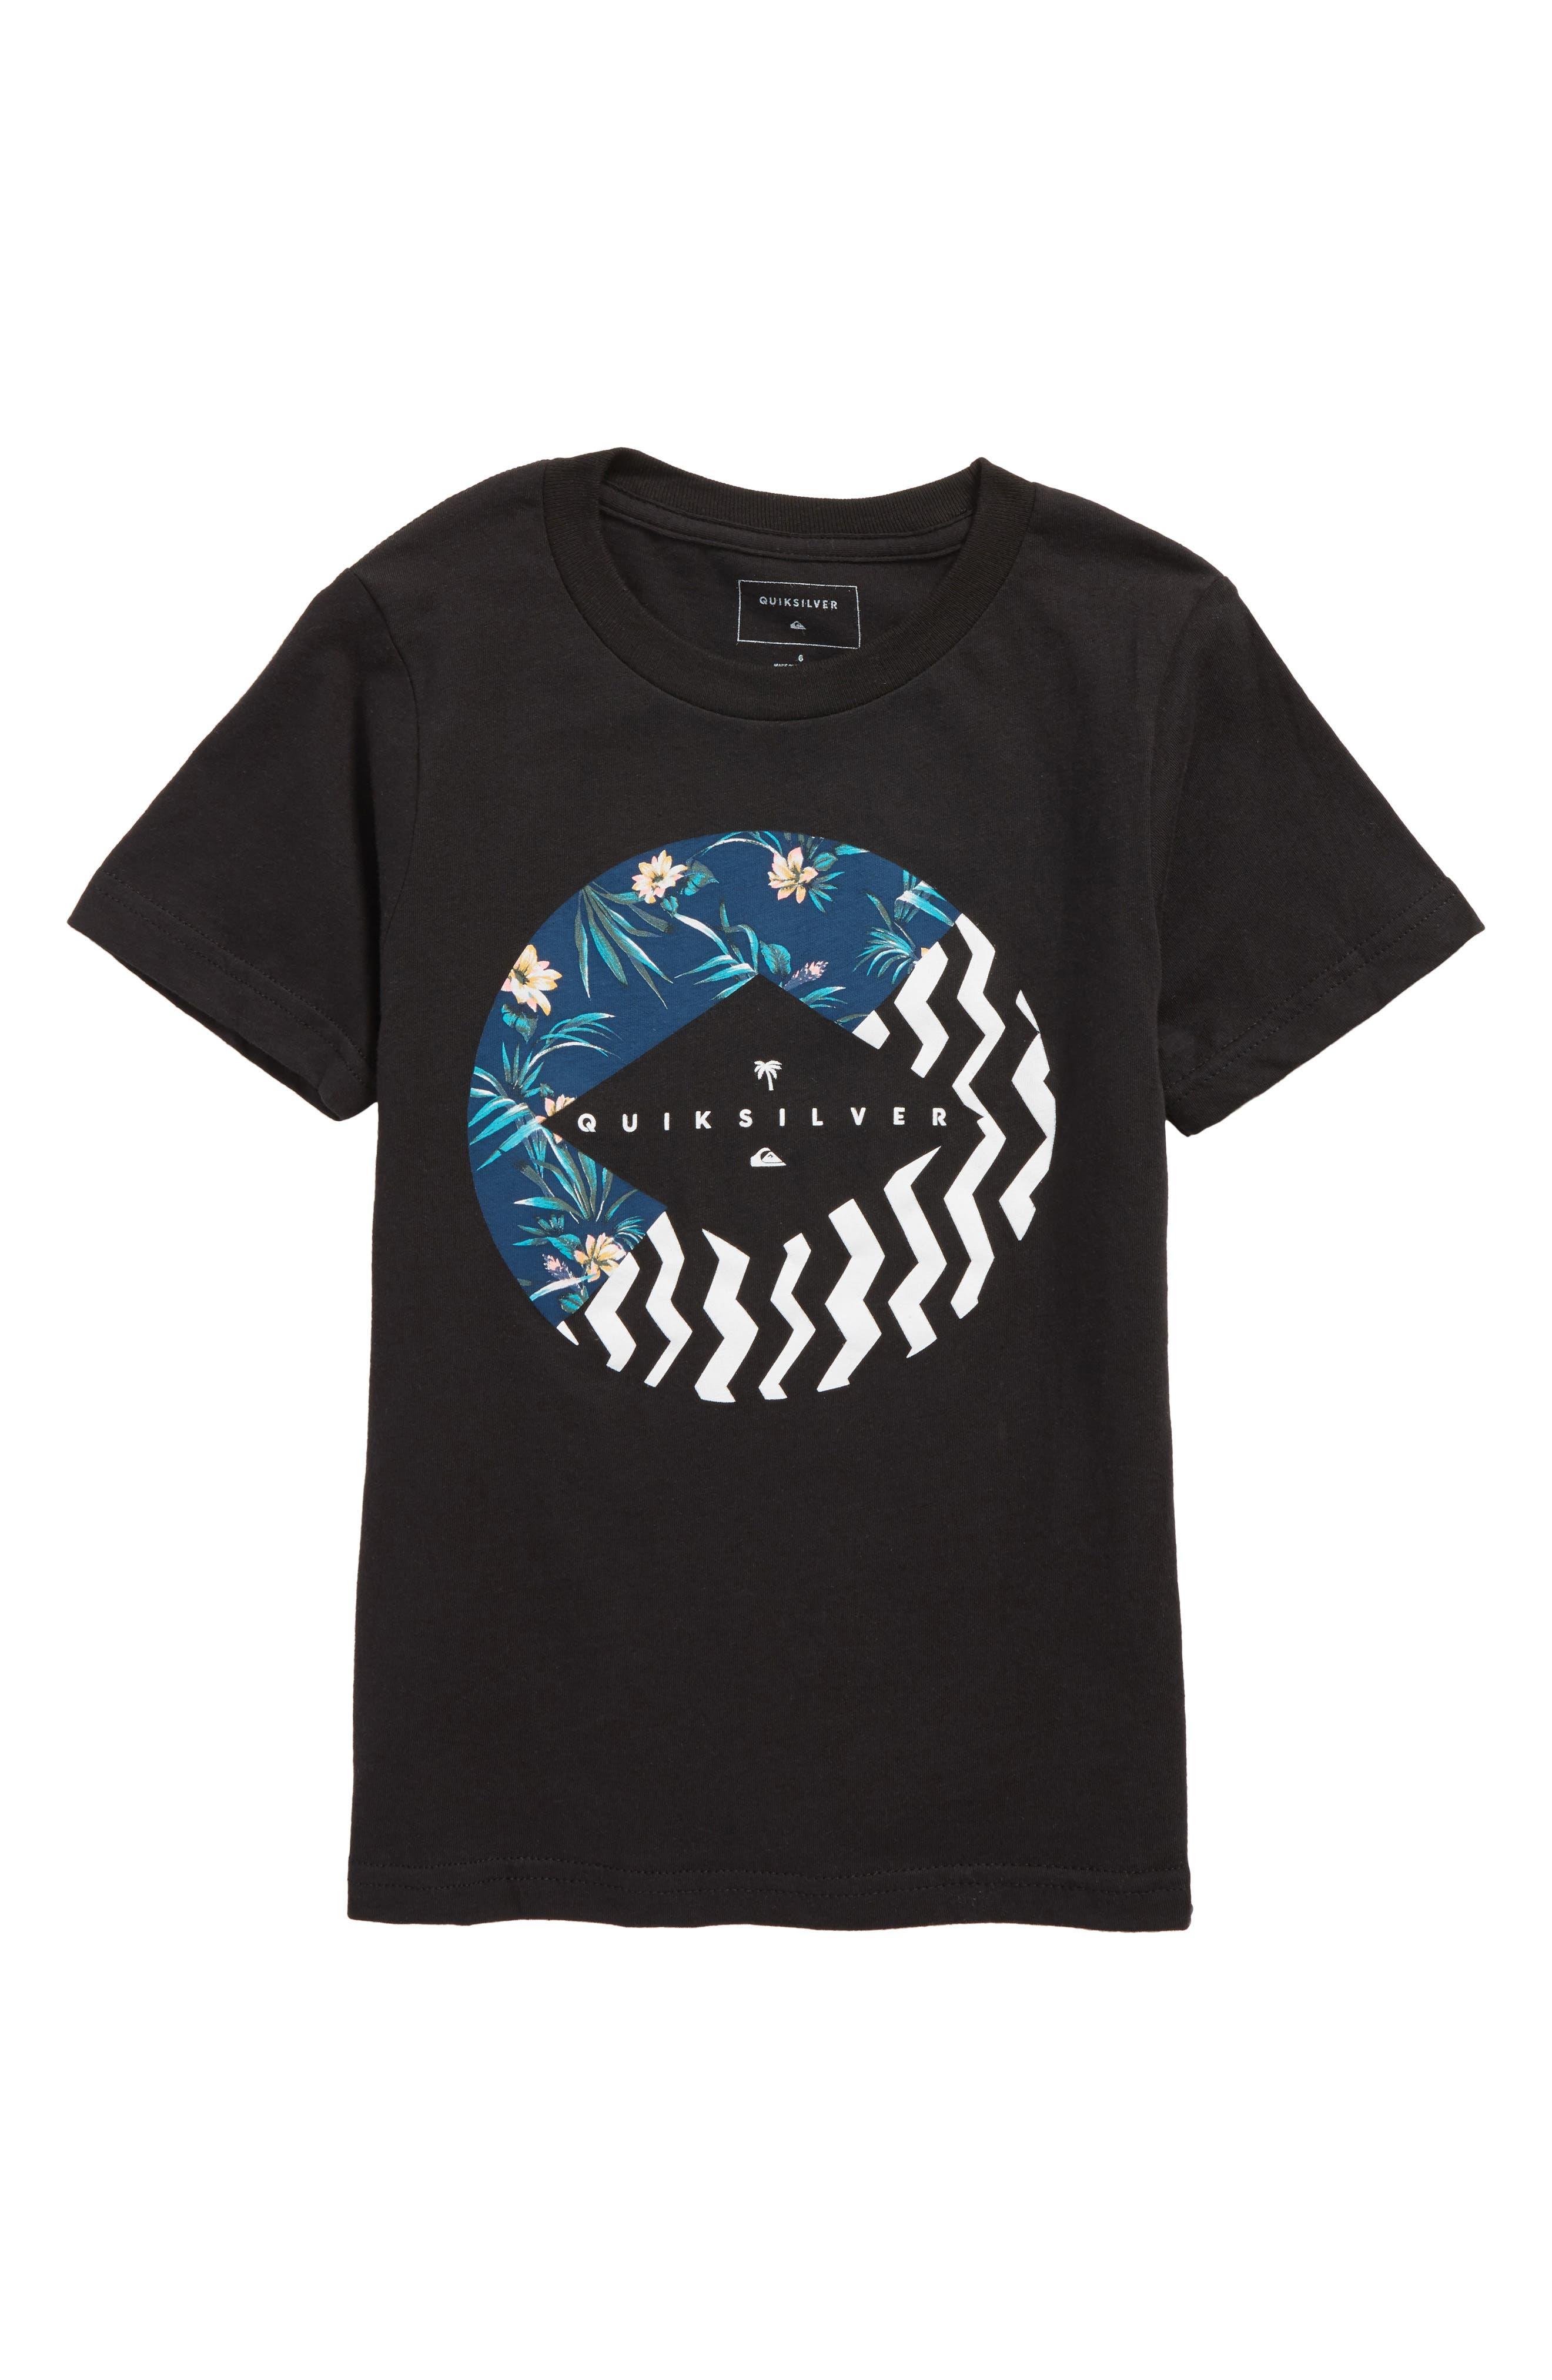 Quiksilver Vert Times Graphic T-Shirt (Toddler Boys & Little Boys)